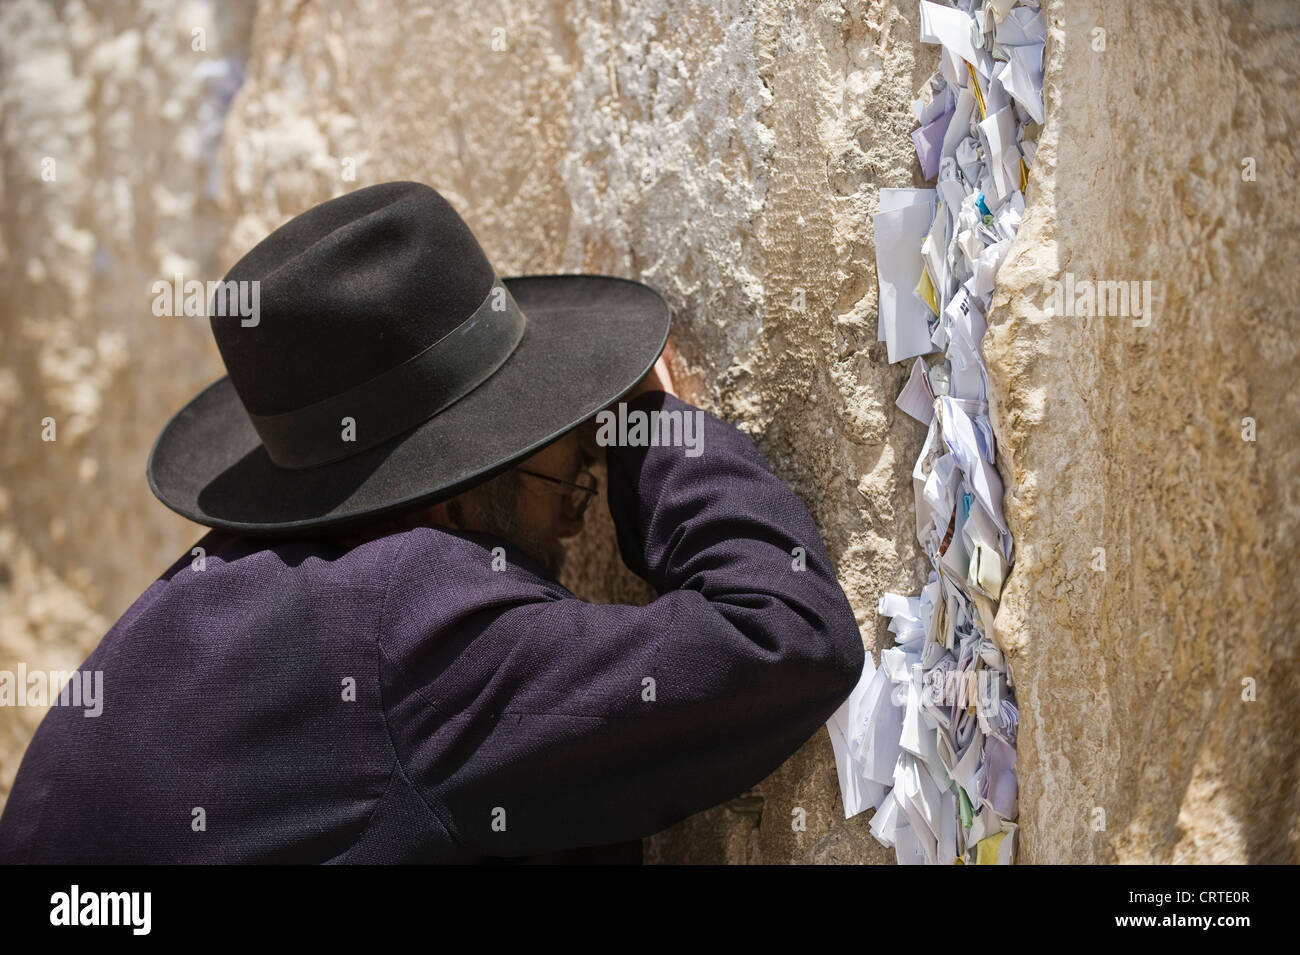 Religious Jewish man praying at the wailing wall Jerusalem in Palestine/ Isreal - Stock Image